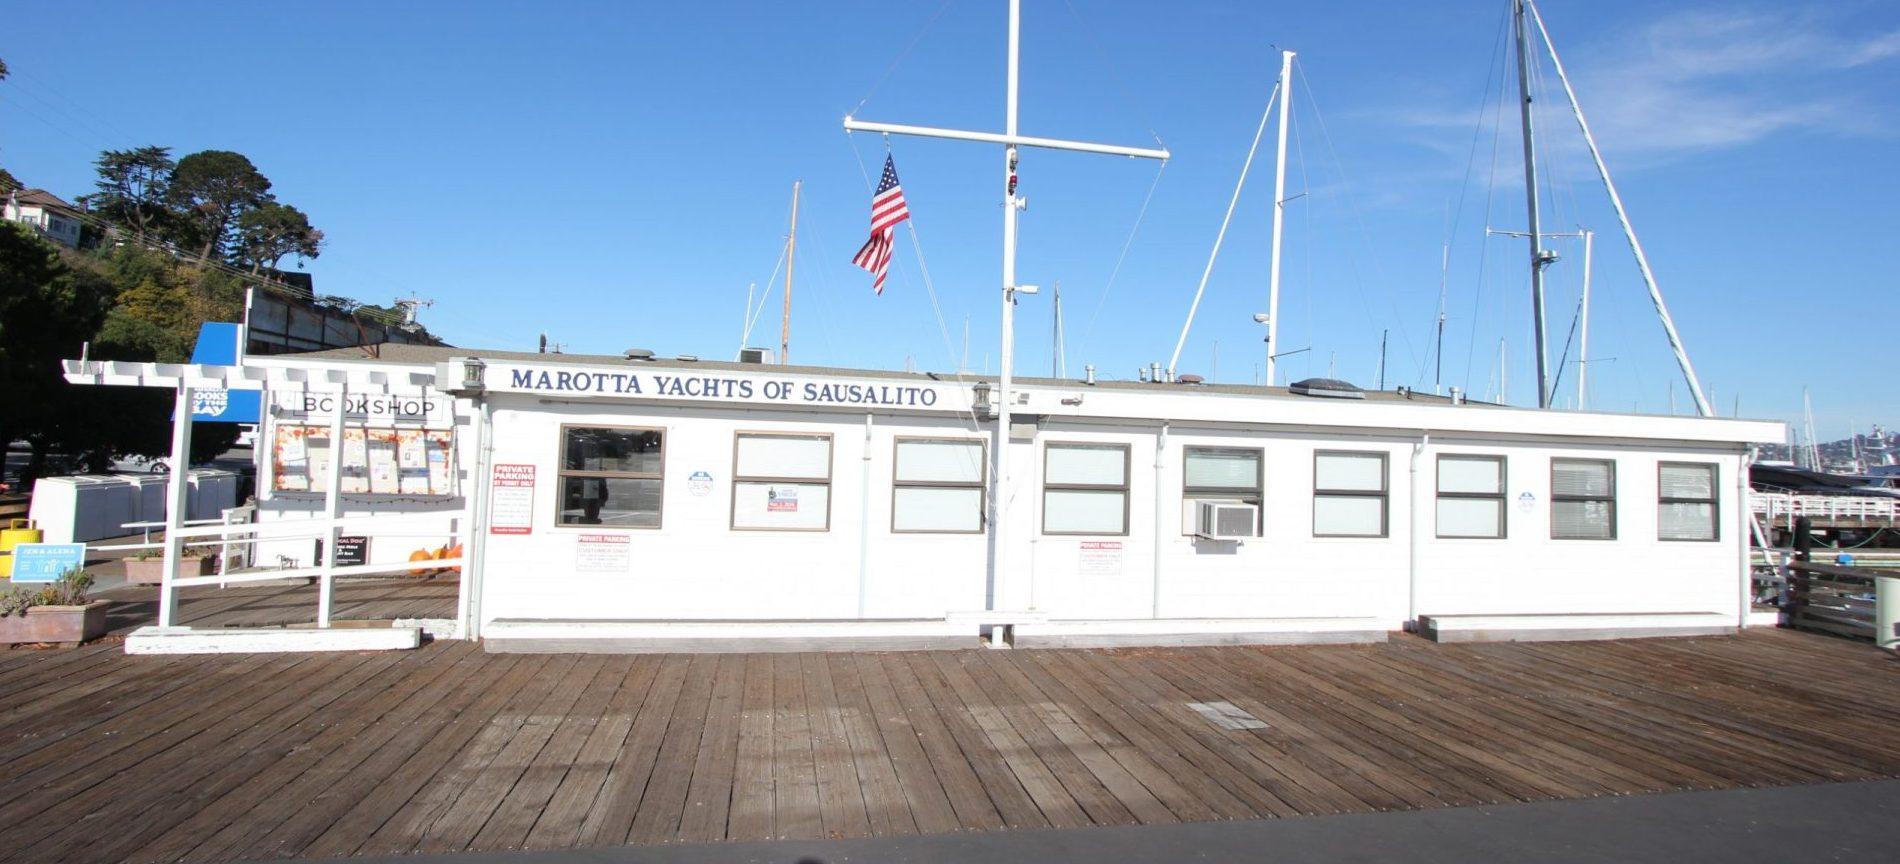 Marotta yachts office